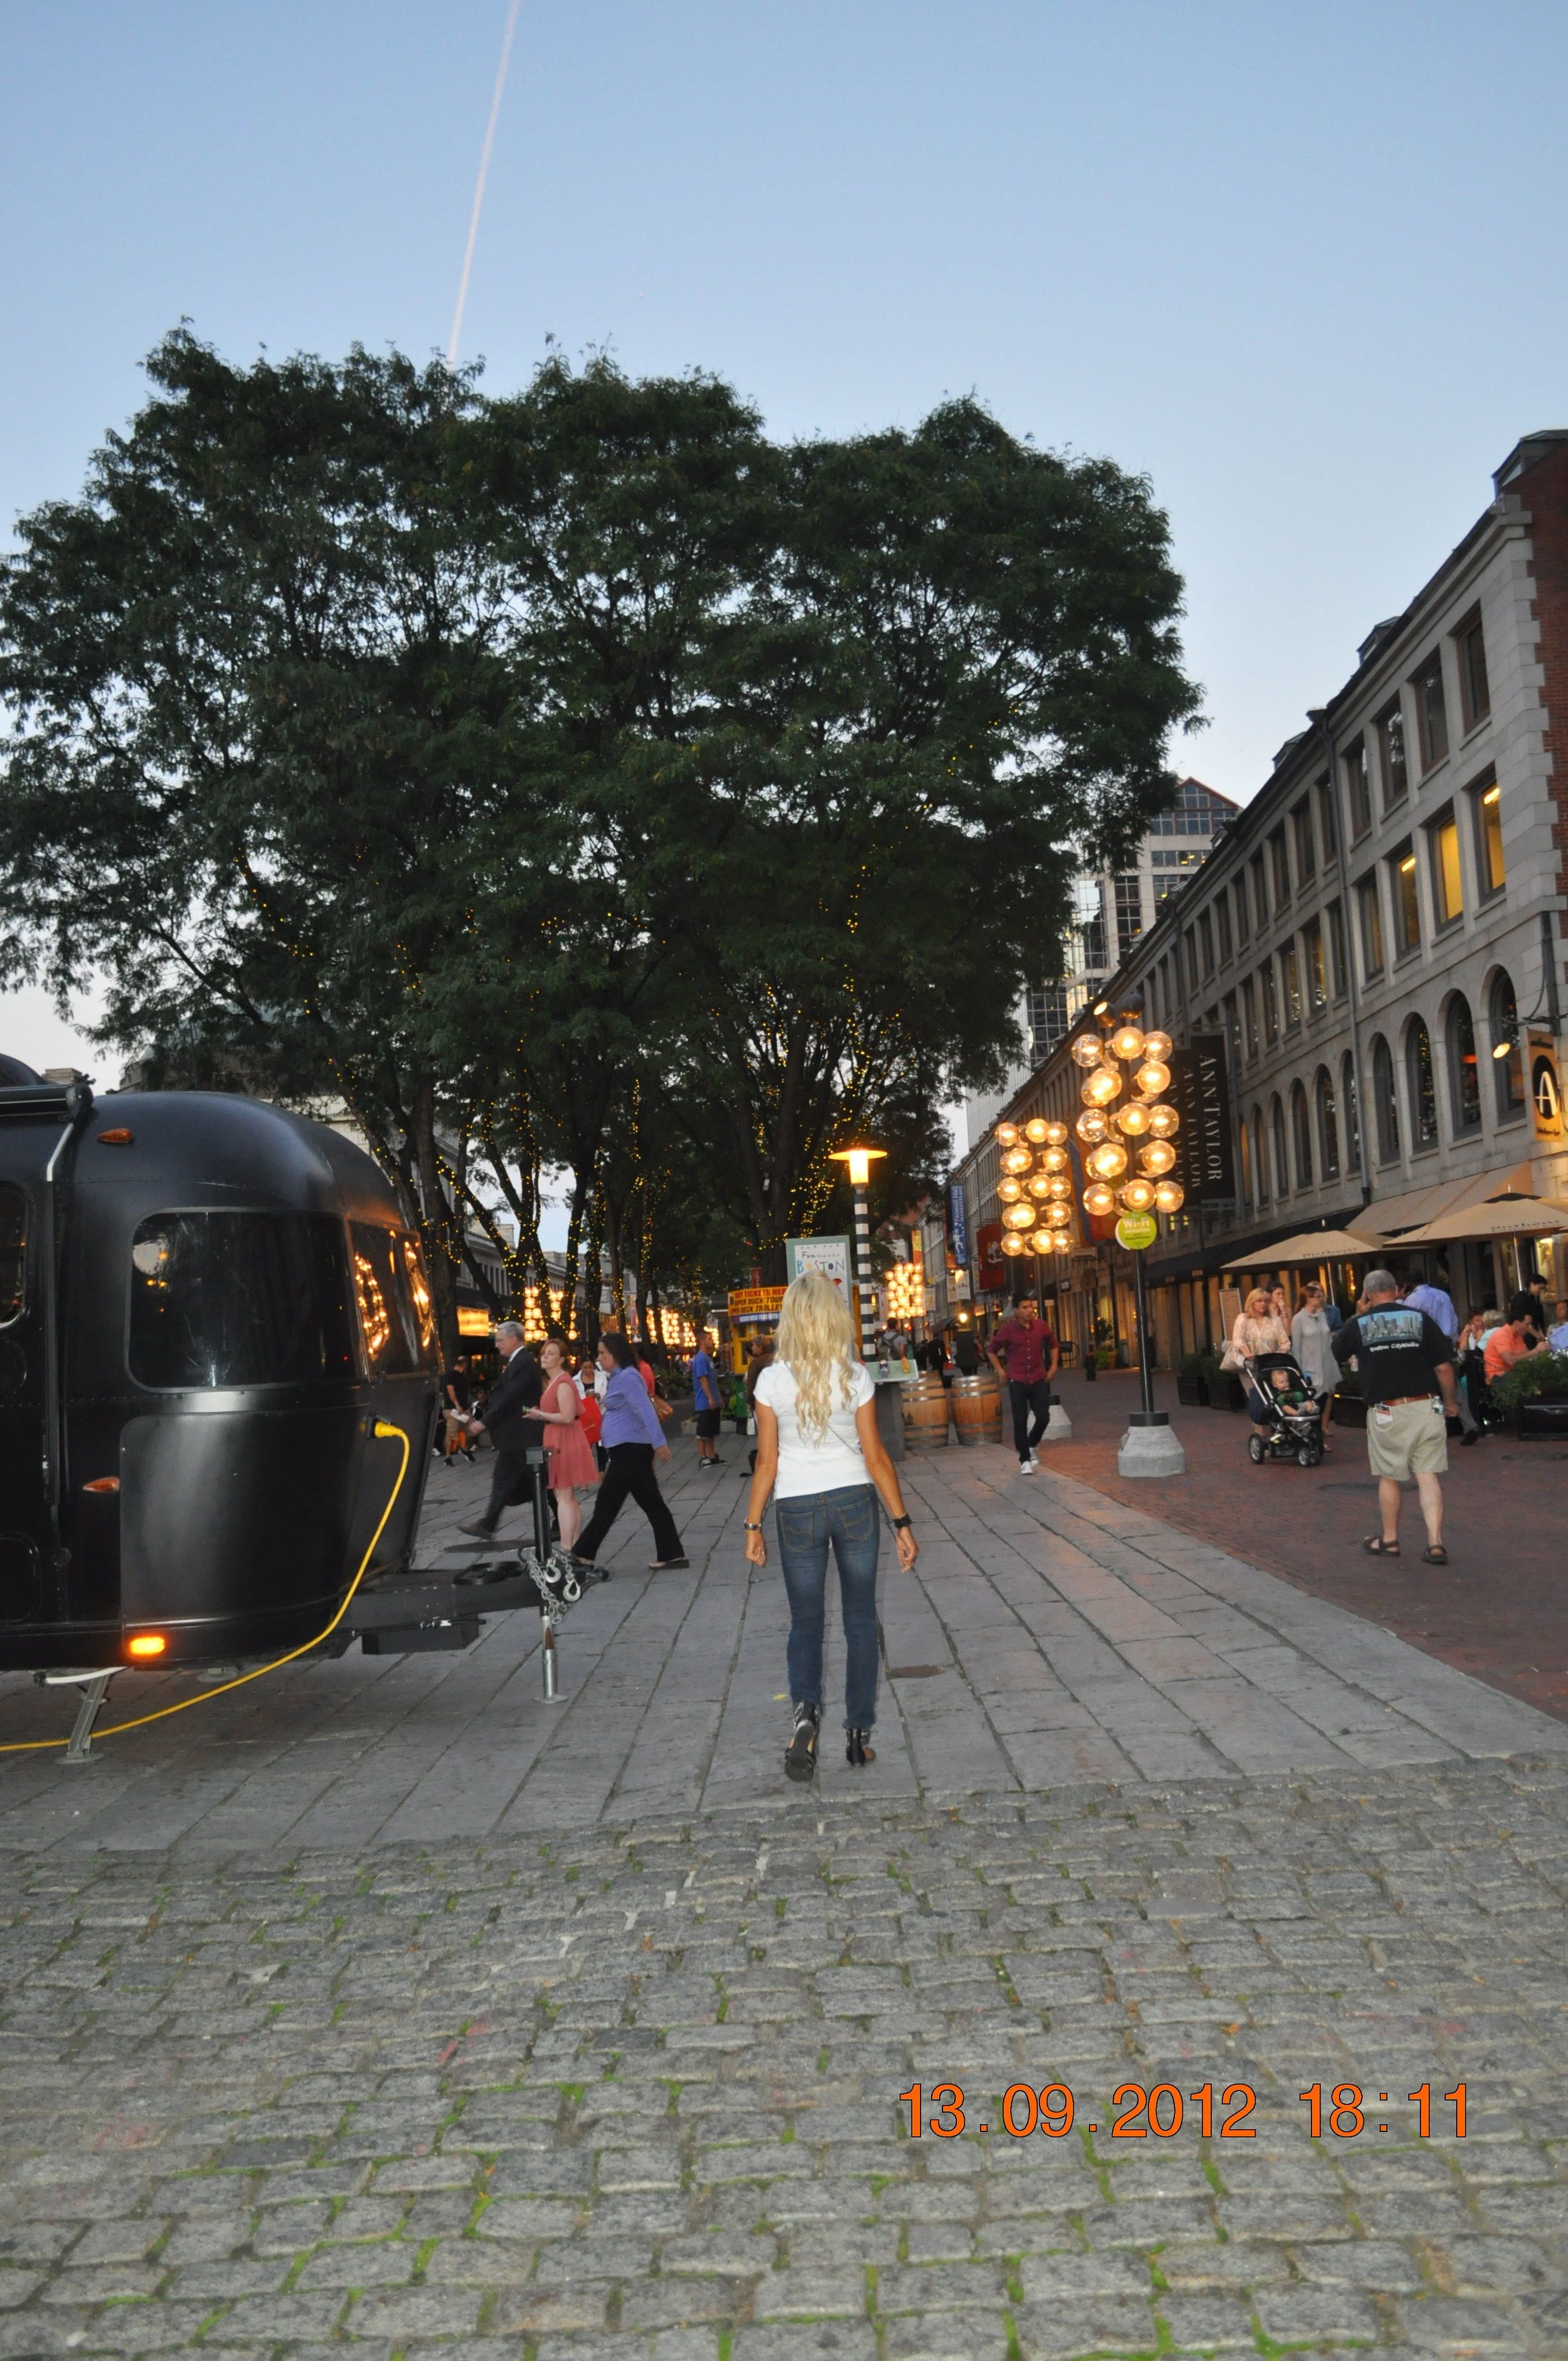 Christmas Fair Charlestown Nh 2020 Near Market Square Boston Ma   26 in 2020 | Walking tour, Factory